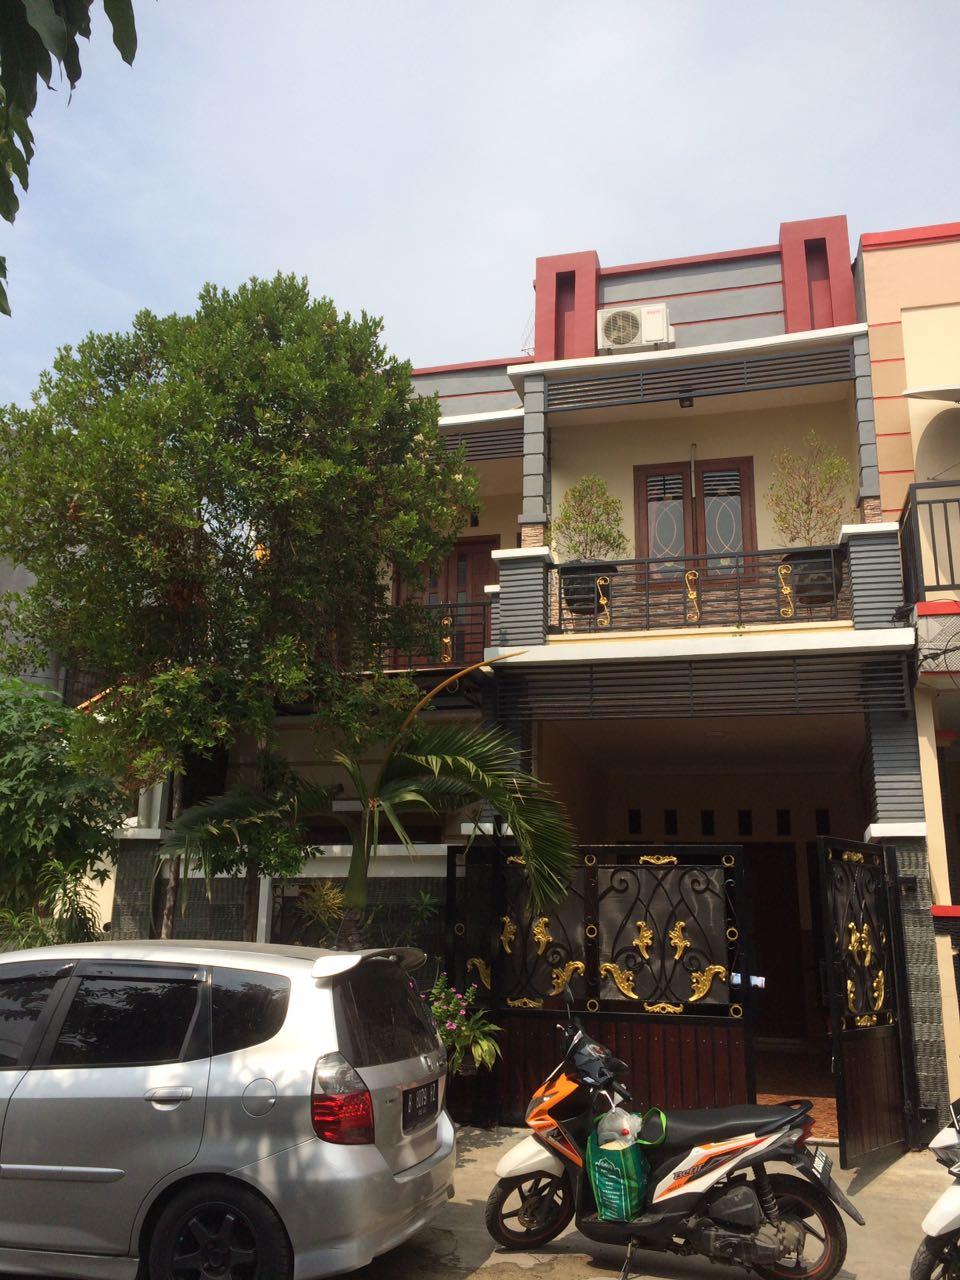 Rumah dijual murah di Duta Bumi 2 , Harapan Indah Bekasi